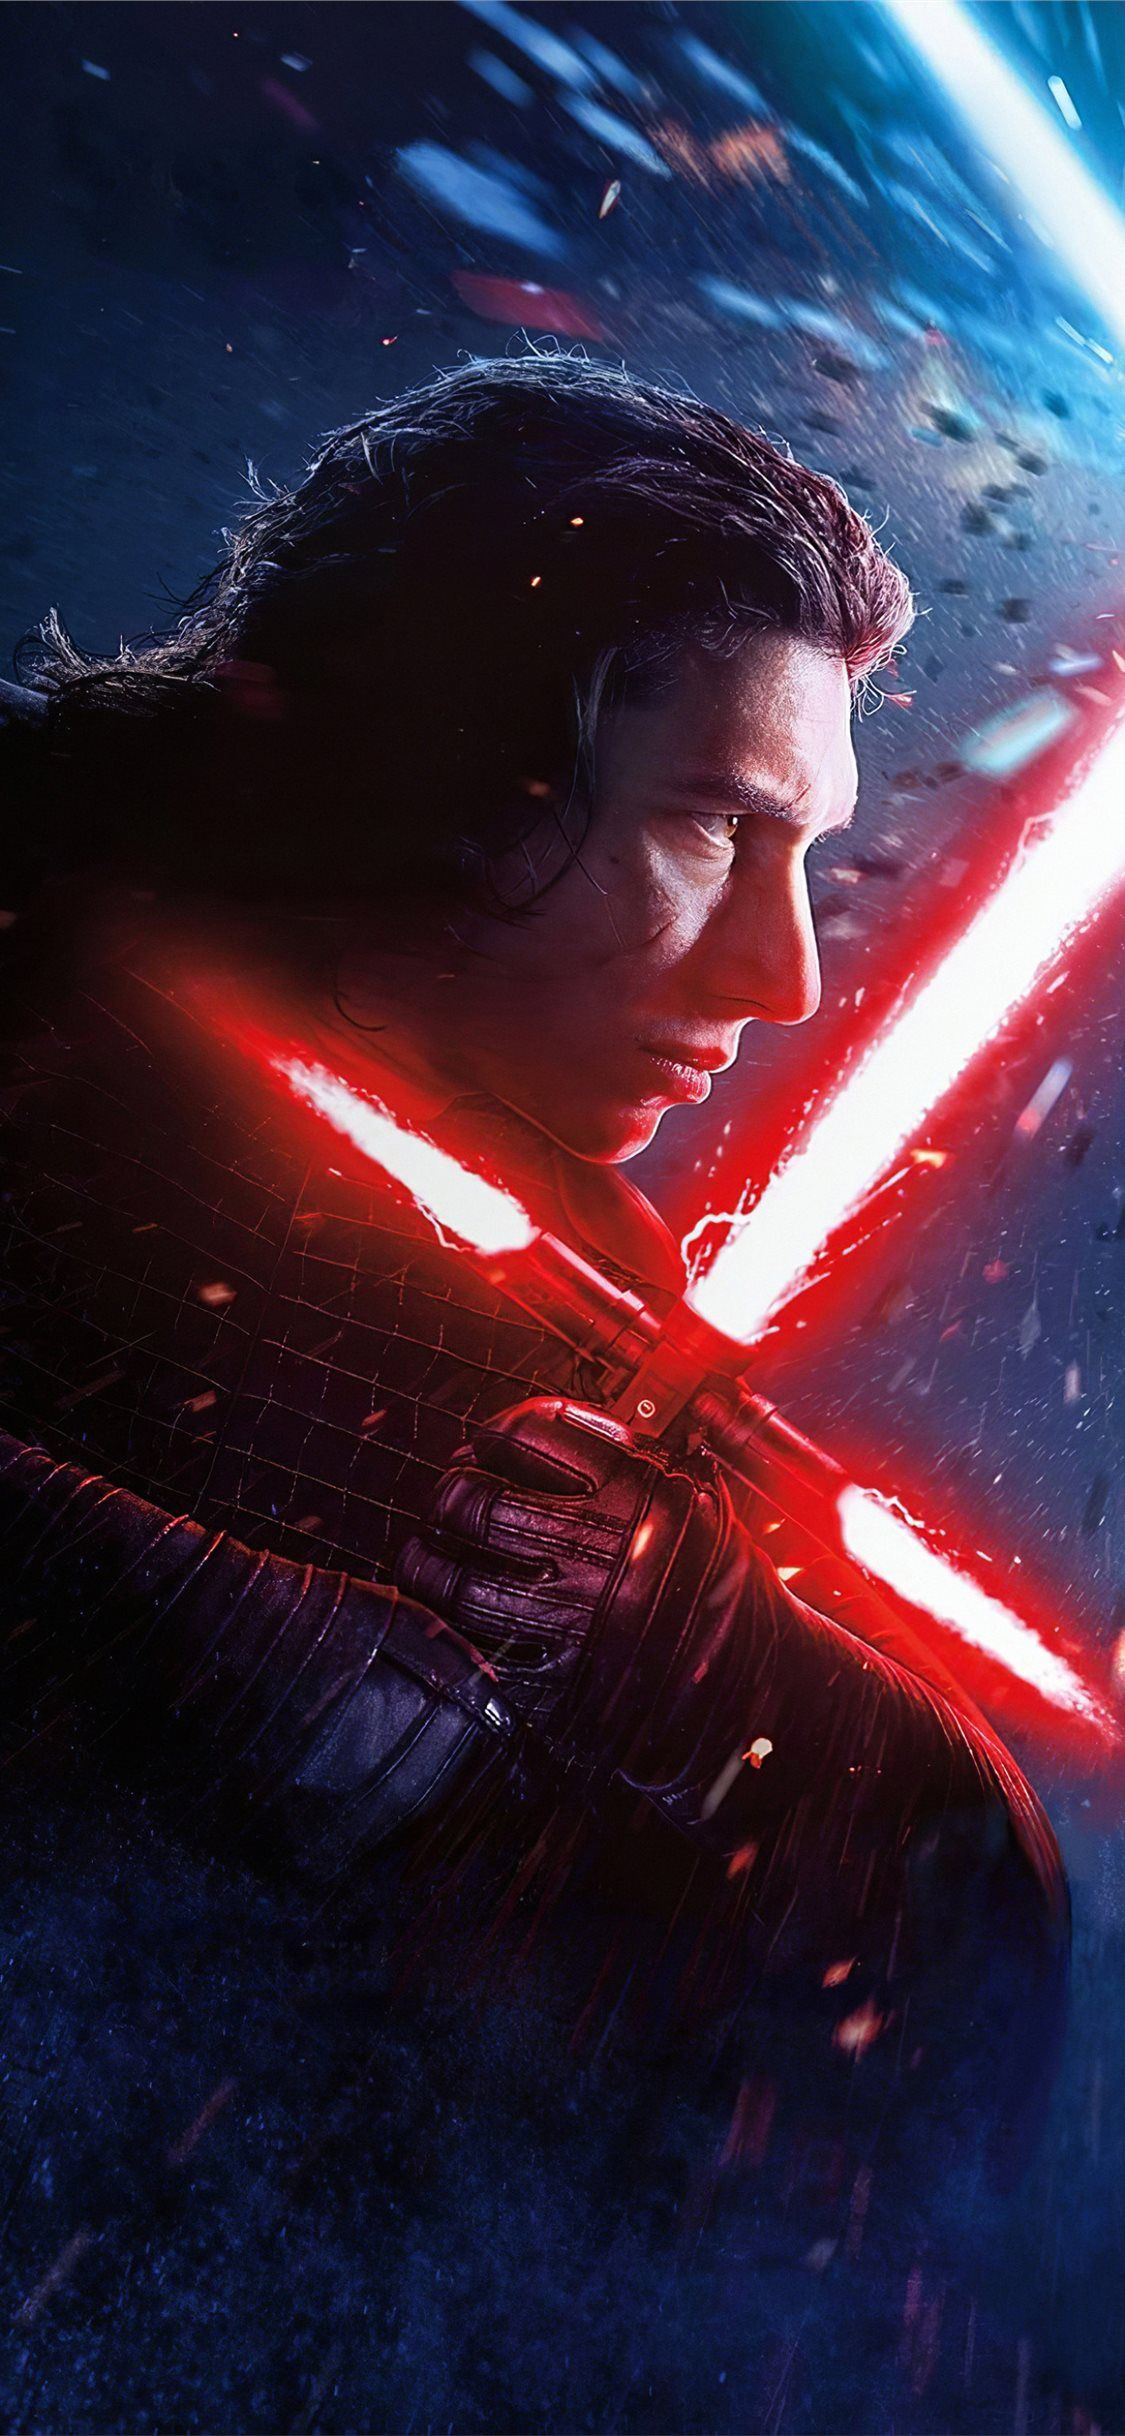 Star Wars The Rise Of Skywalker Poster 4k 2019 Starwarstheriseofskywalker Rey Movies 2019movies Starwars Star Wars Poster Star Wars Makeup Leia Star Wars